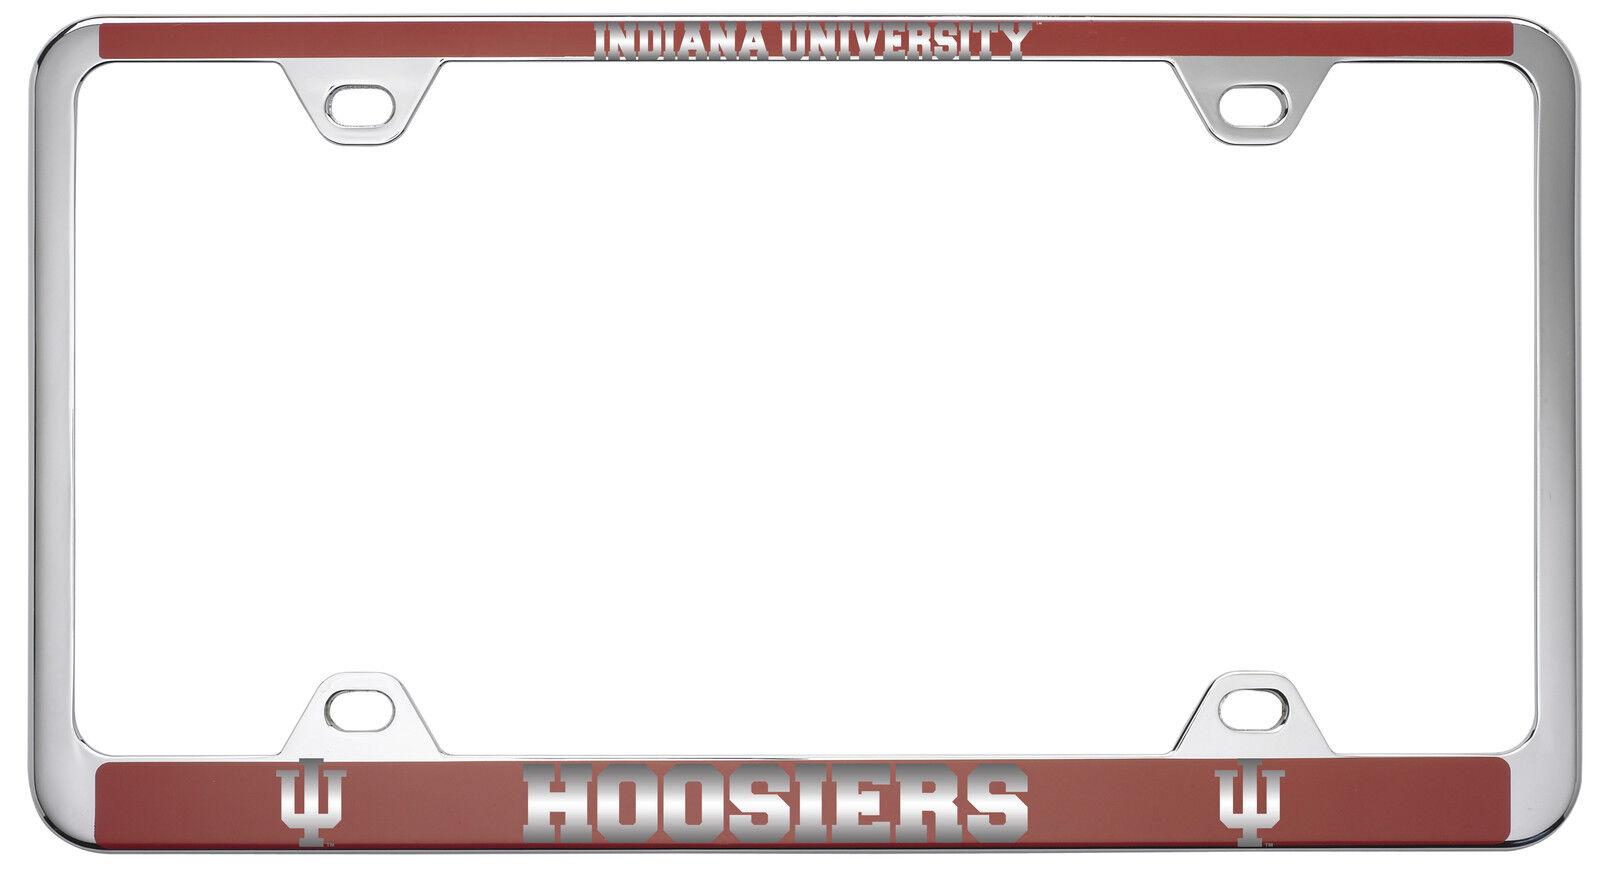 Indiana University -metal License Plate Frame-red | eBay